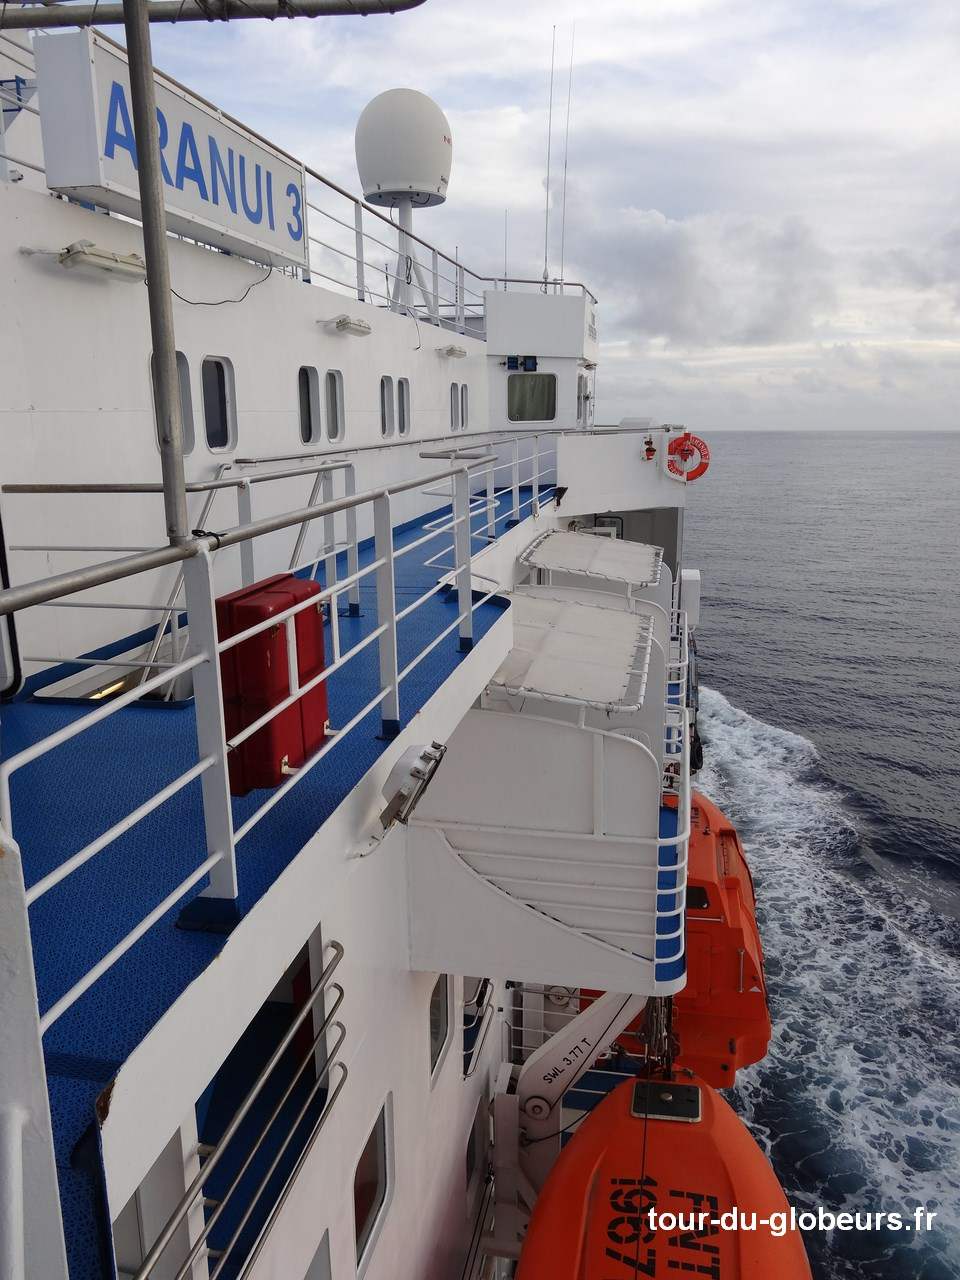 Marquises - Aranui 3 - Canots sauvetage